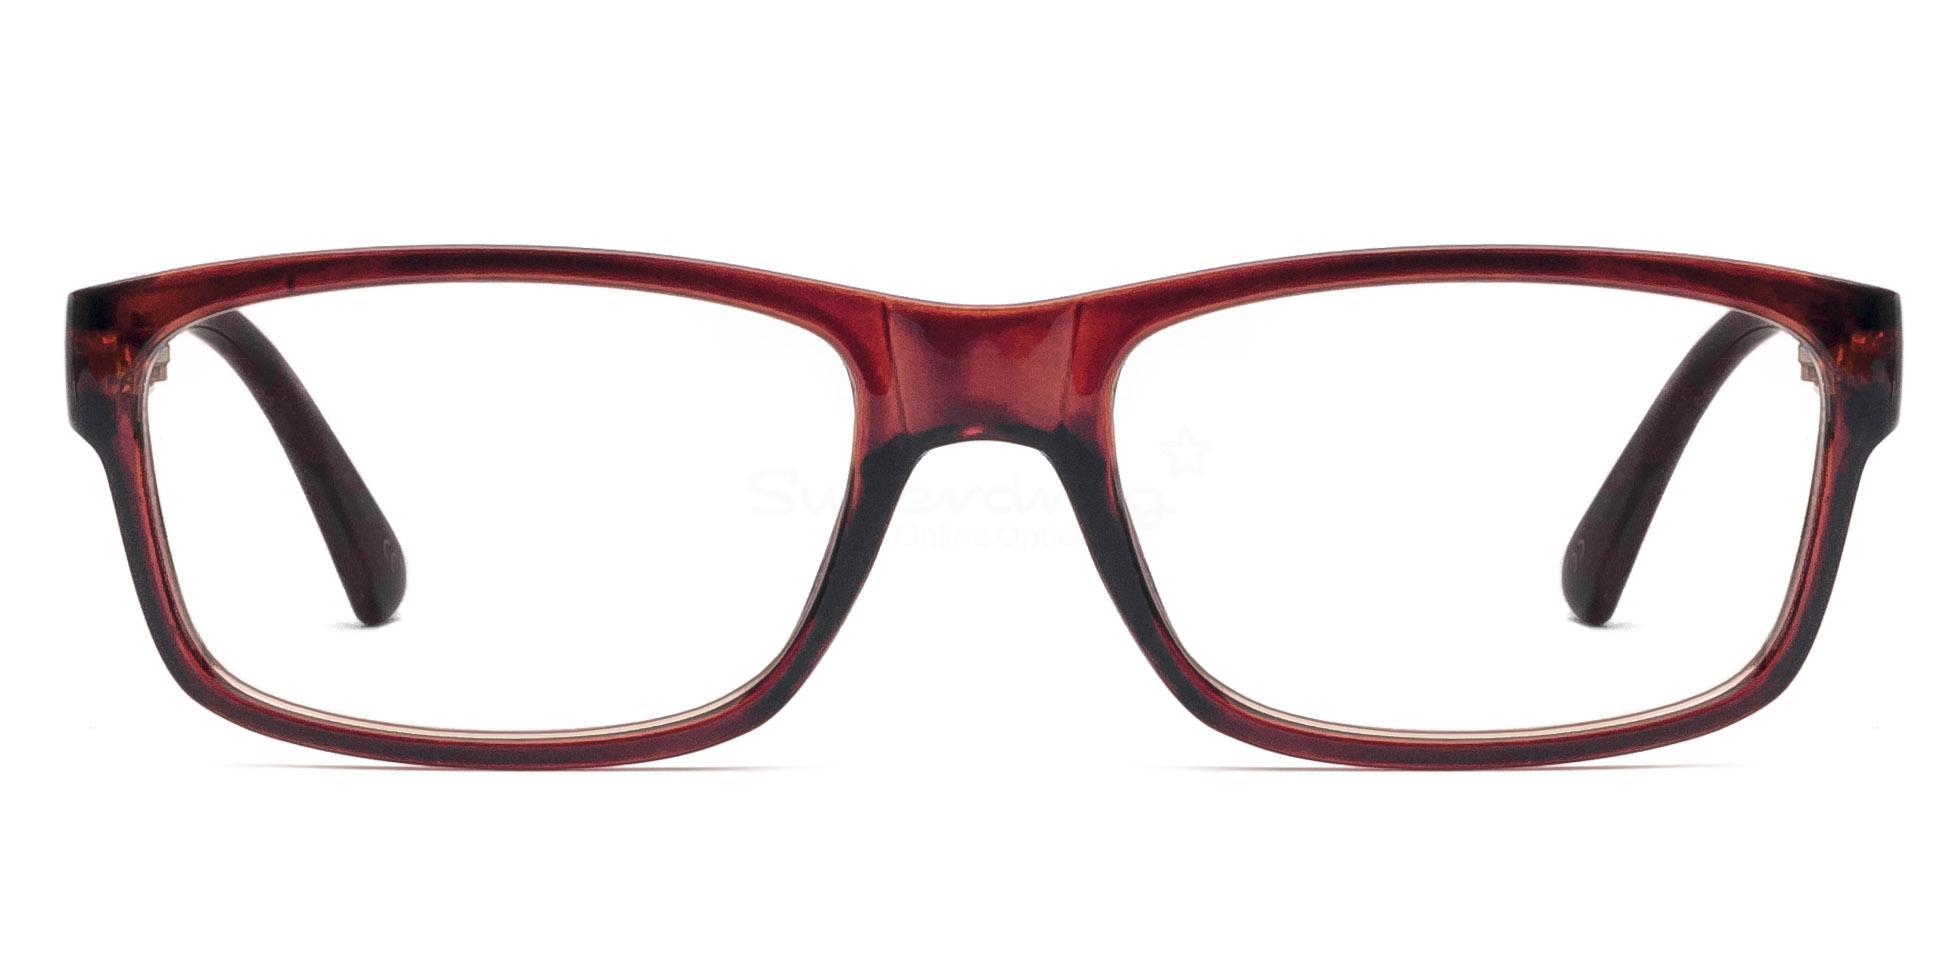 C006 5580 - Brown Glasses, Helium